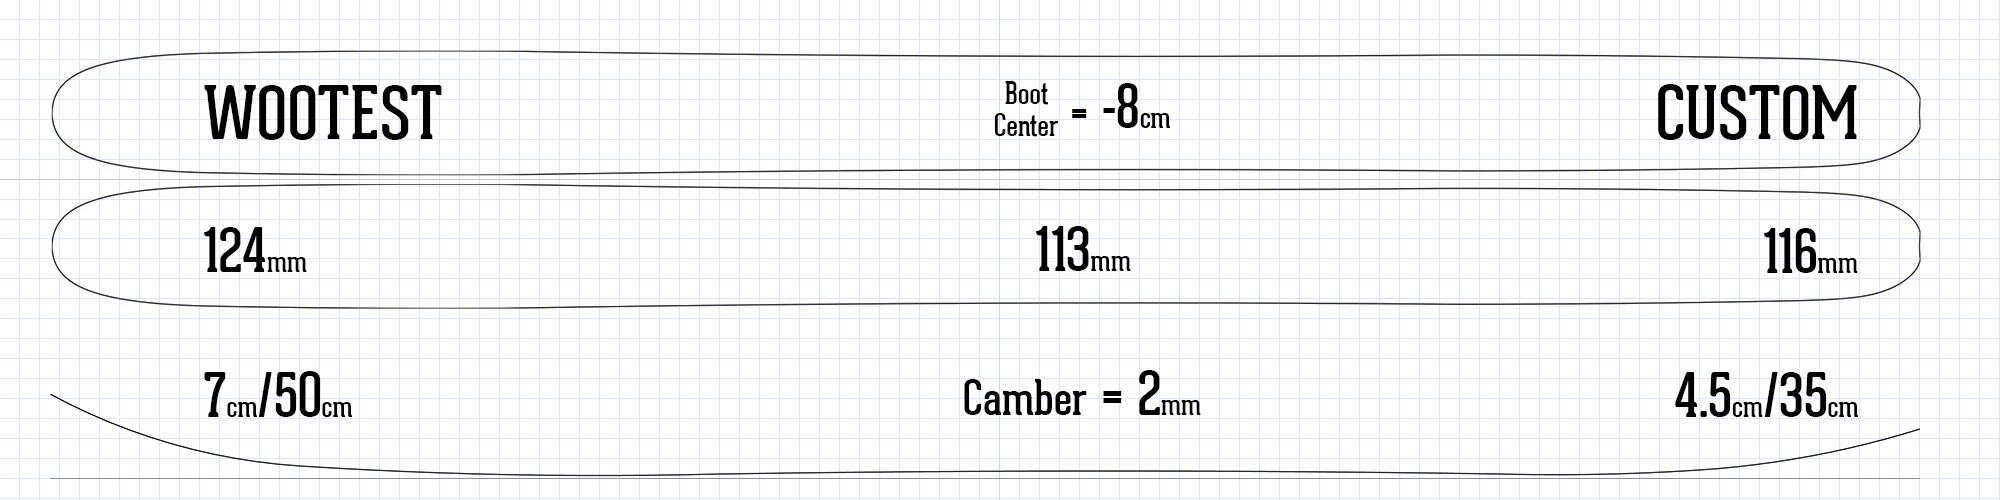 Wootest ski information spec sheet rocker camber profile